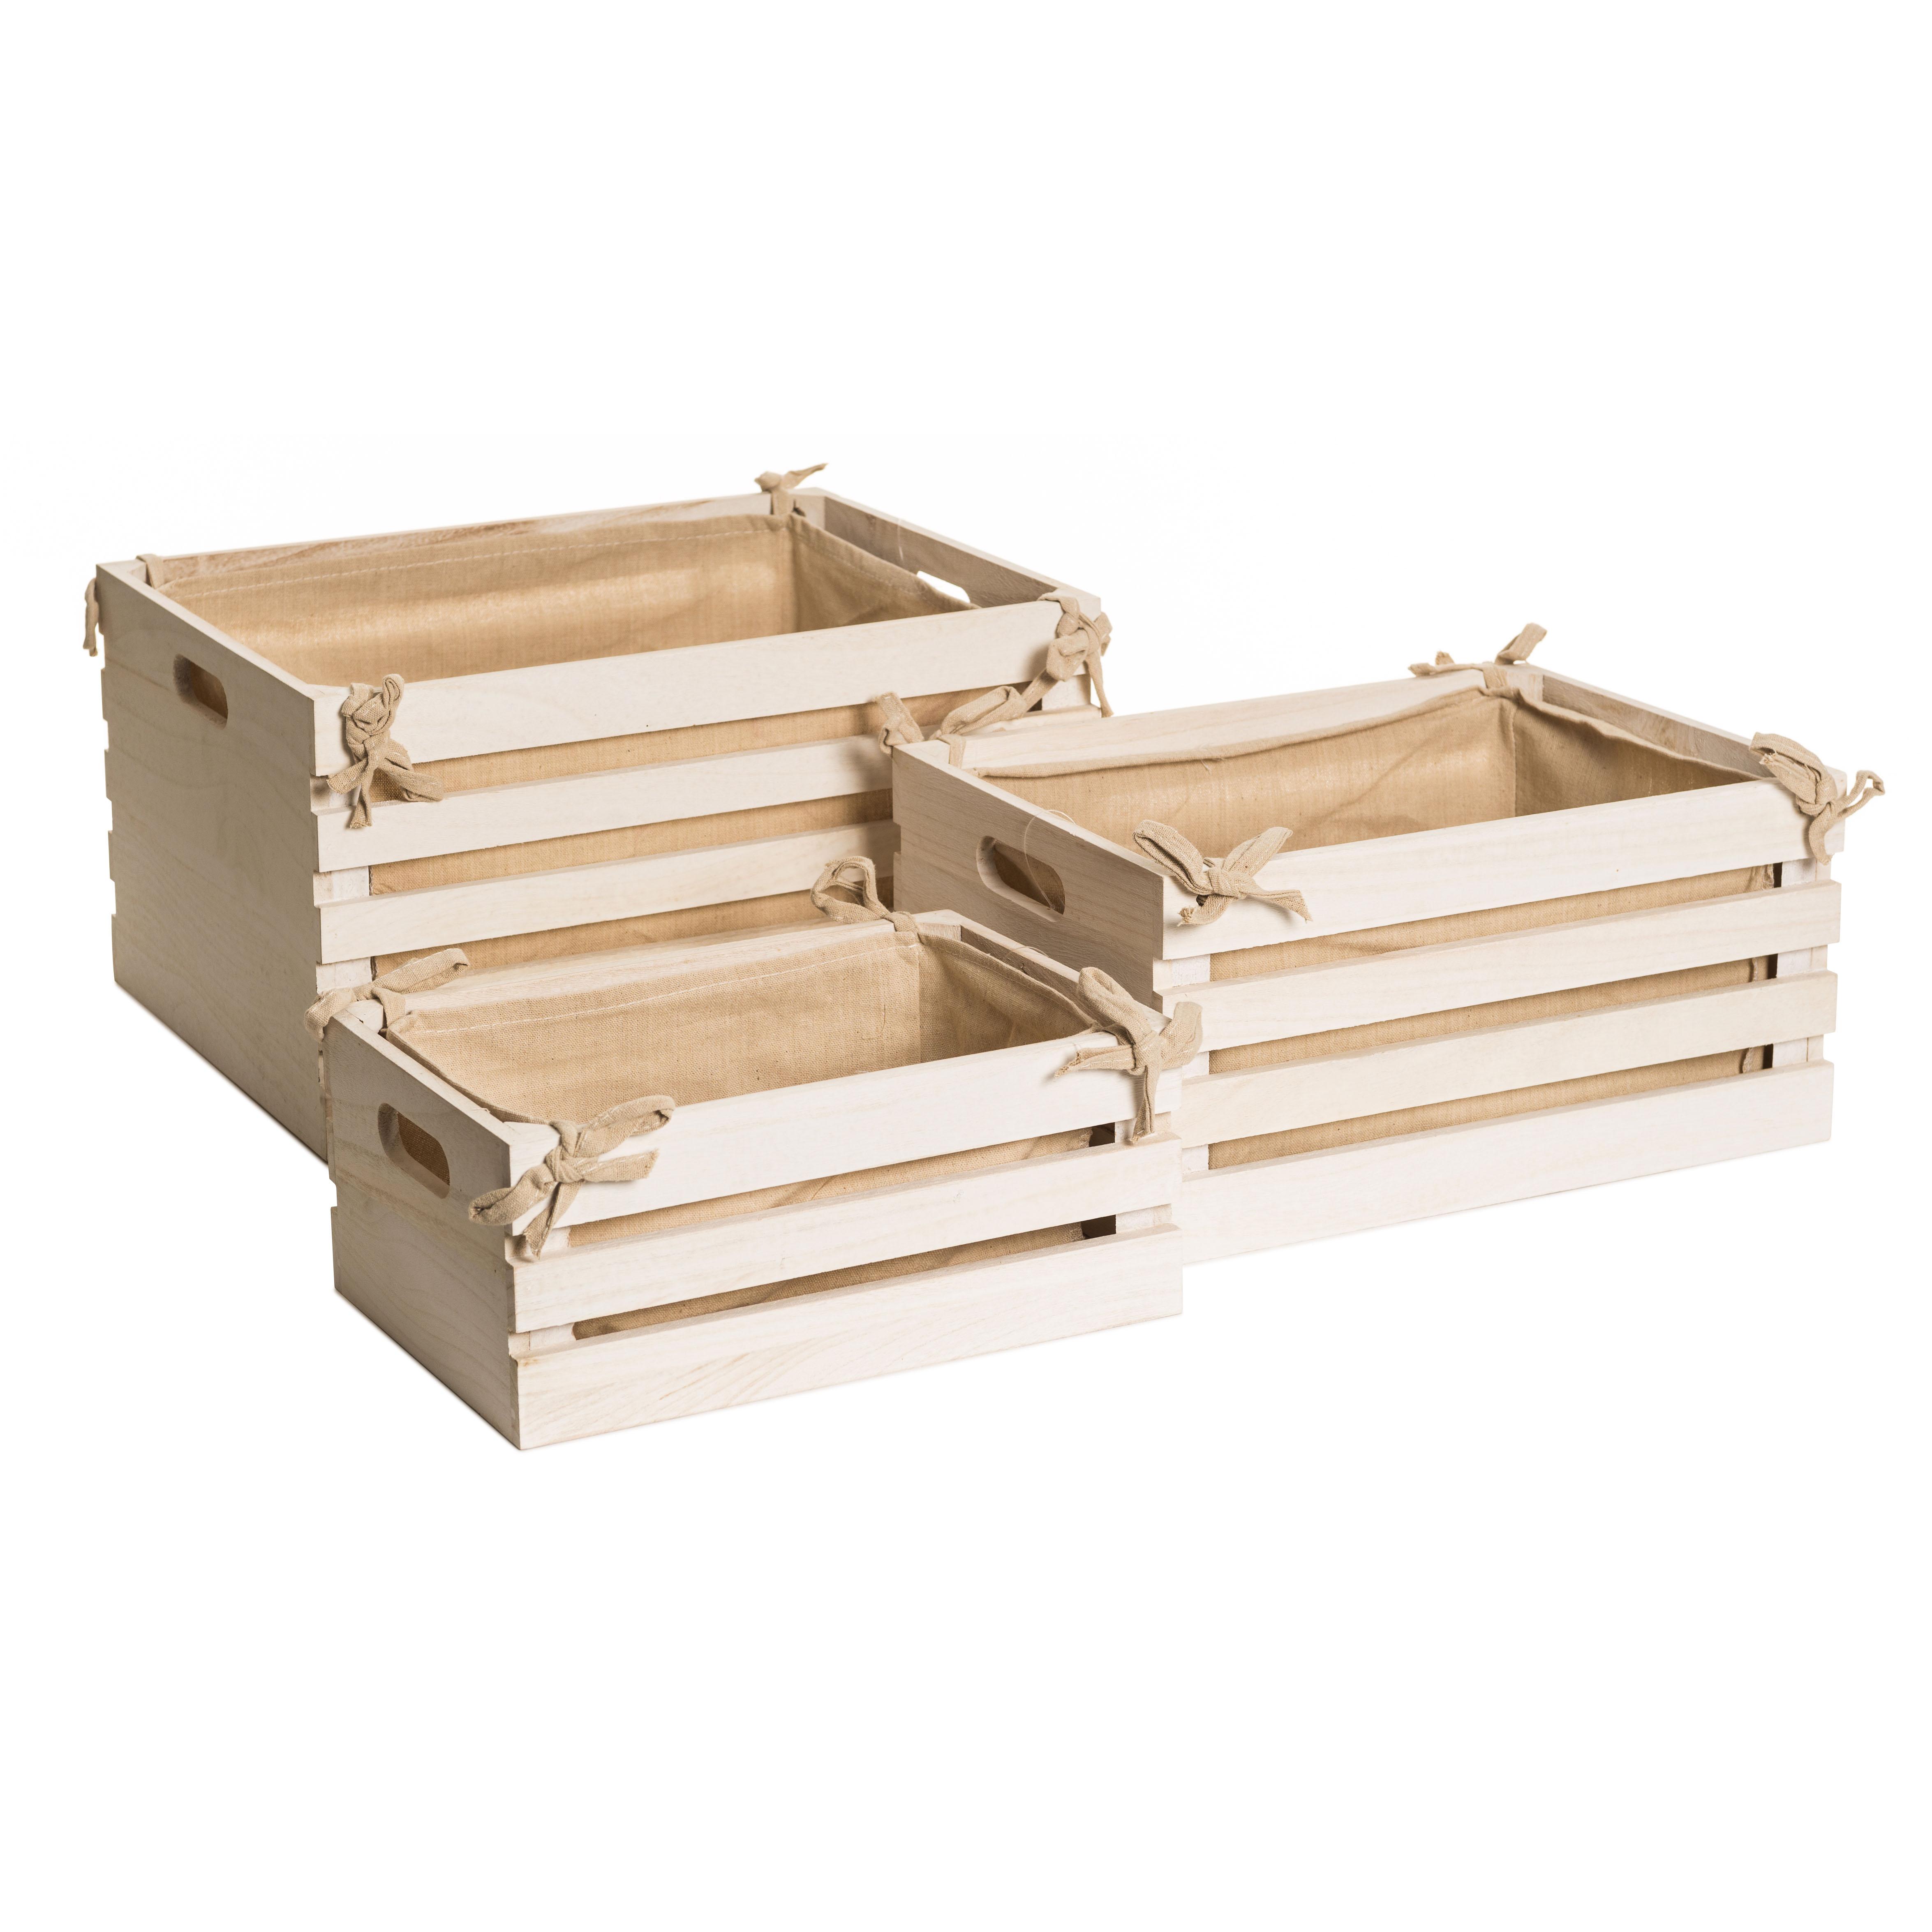 caja de madera blanca 32 21 13cm orden en casa